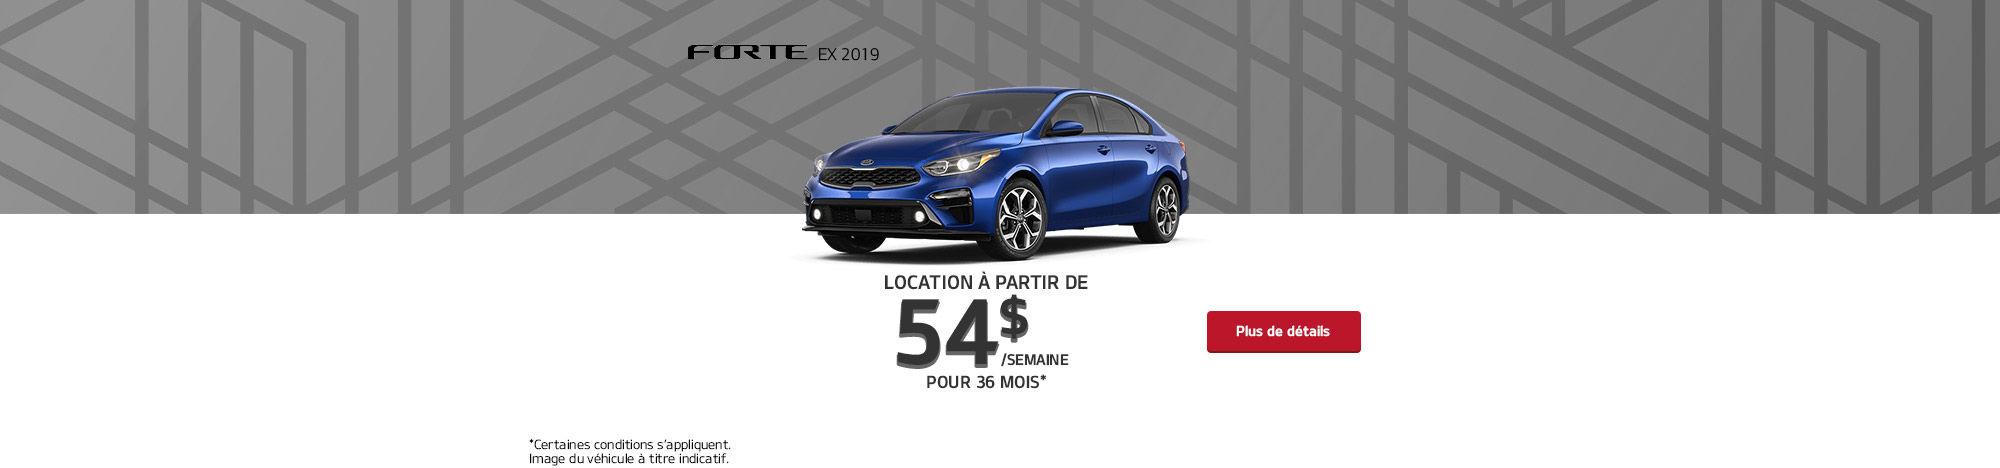 Forte 2019